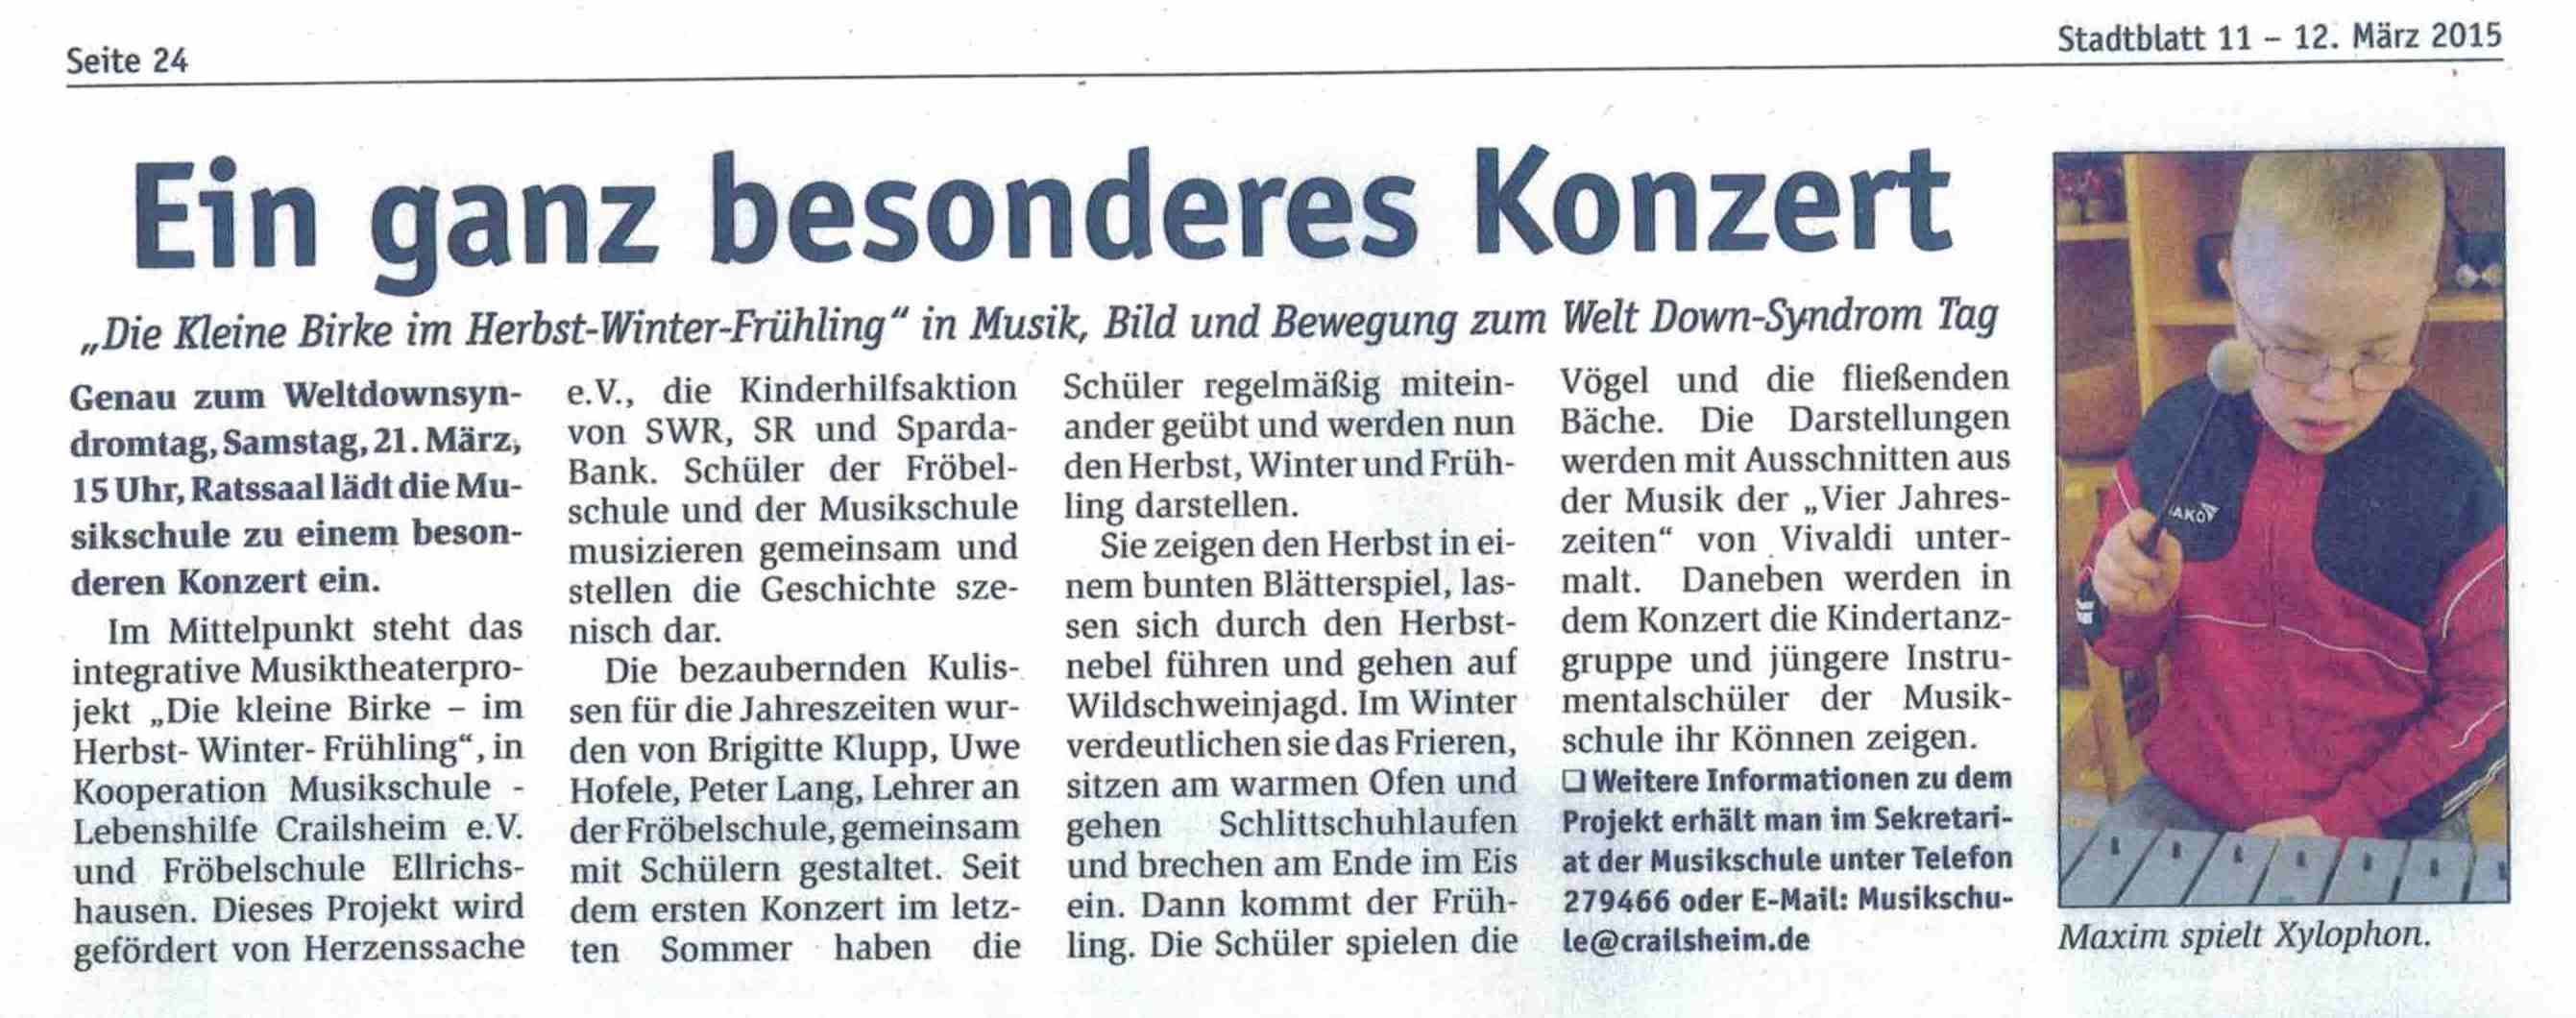 Stadtblatt 2015-3.2.jpg - 174.57 KB